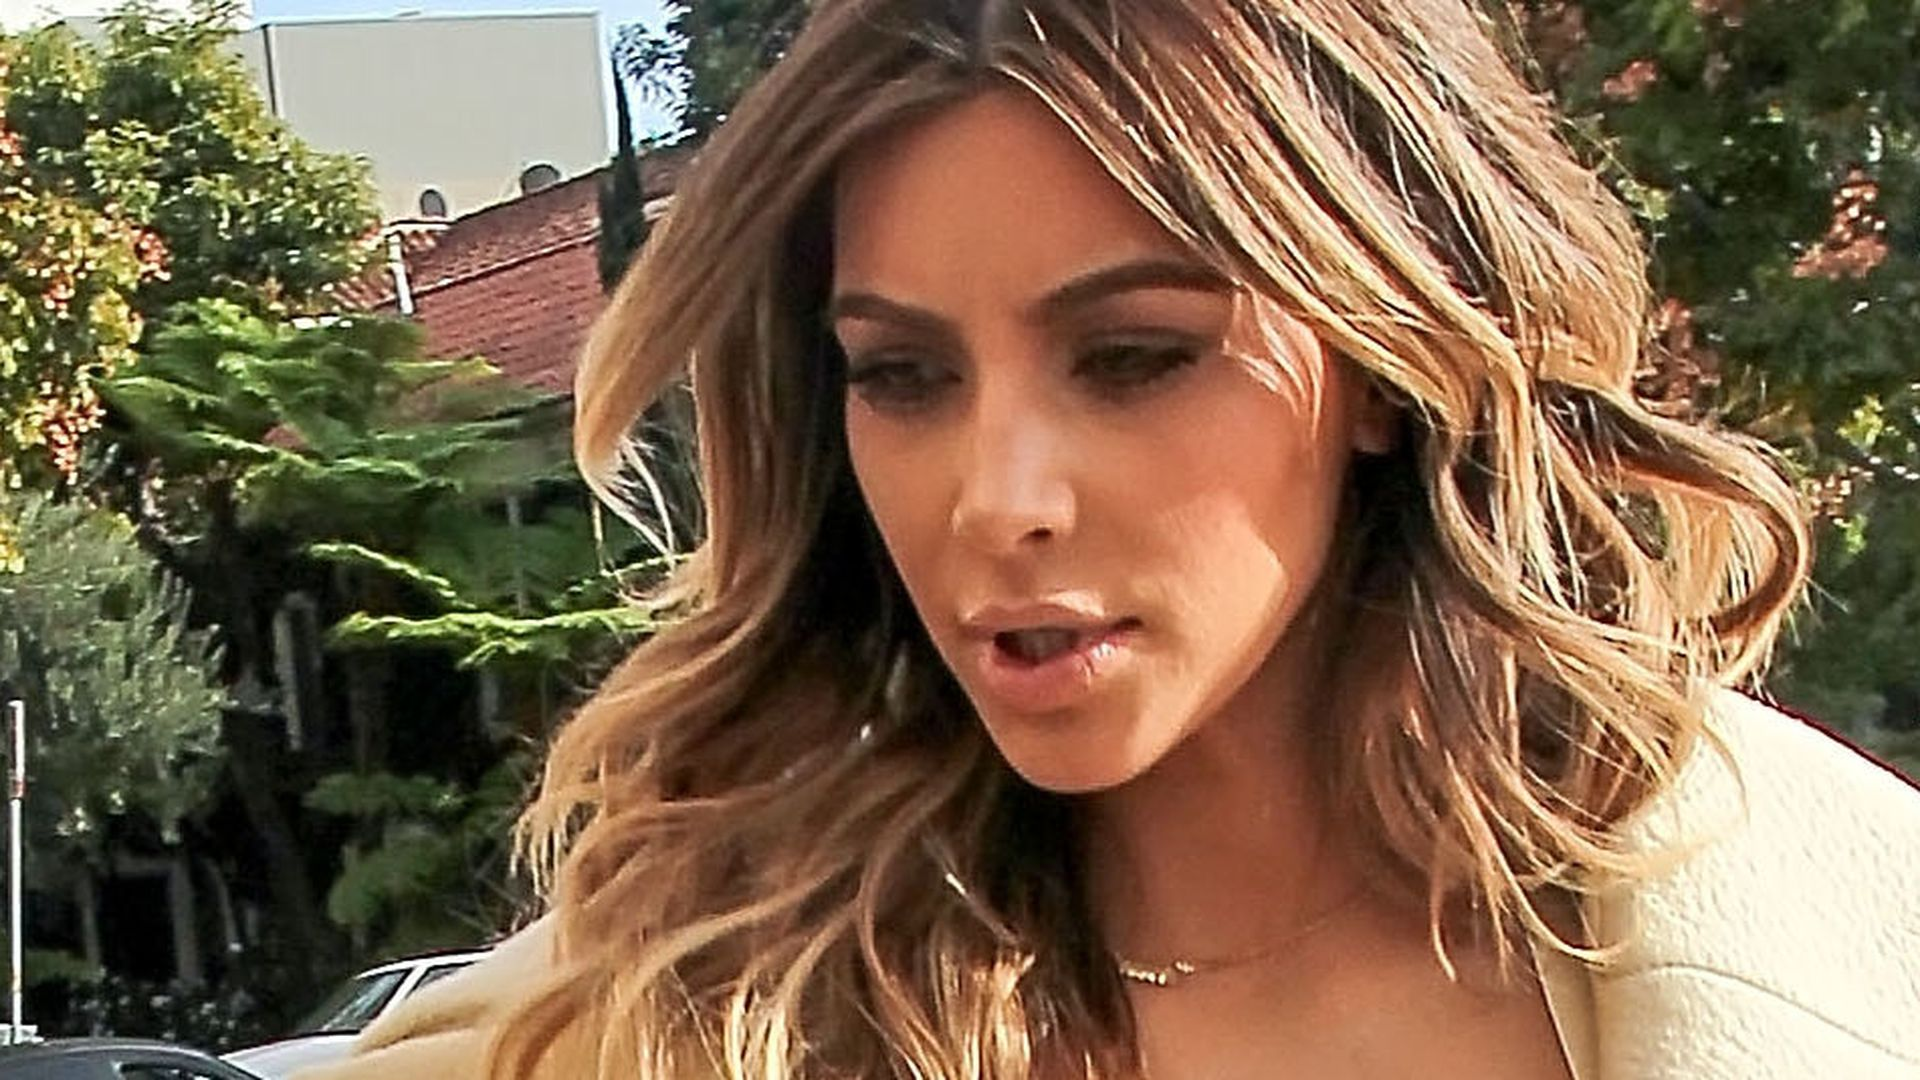 Hochgepusht! Kim Kardashian zeigt XXL-Dekolleté